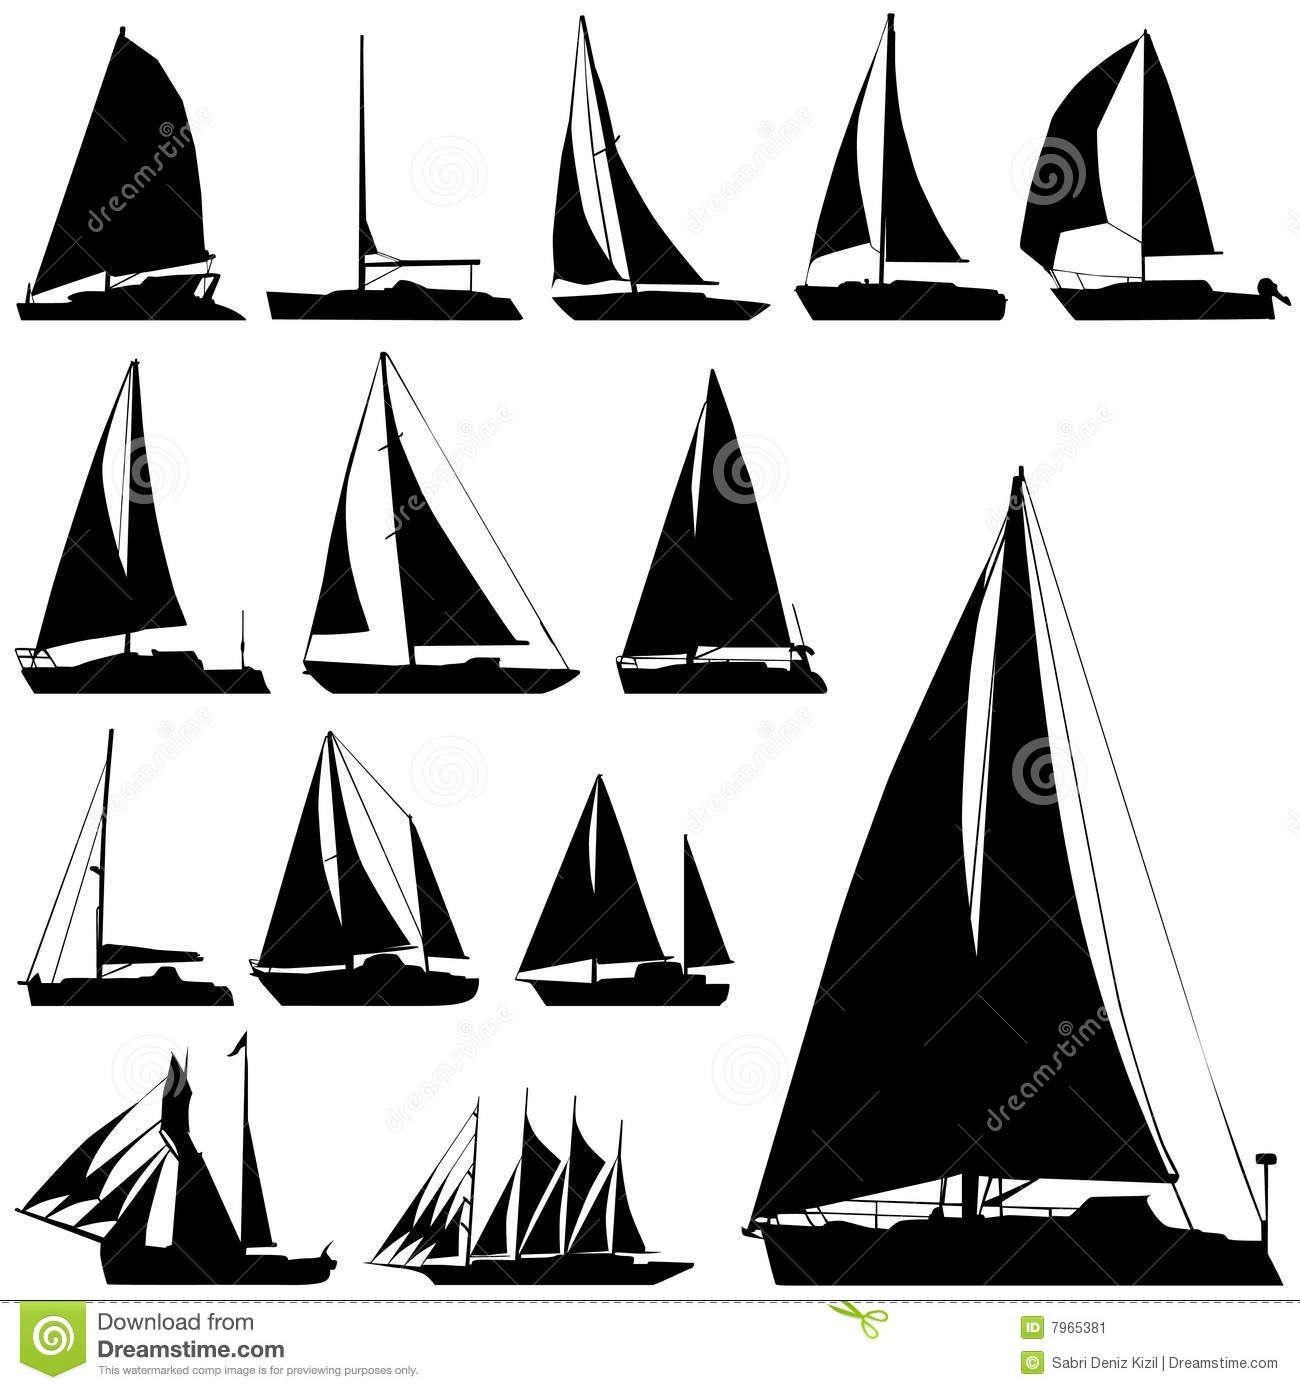 png download Sailing Boat Vector